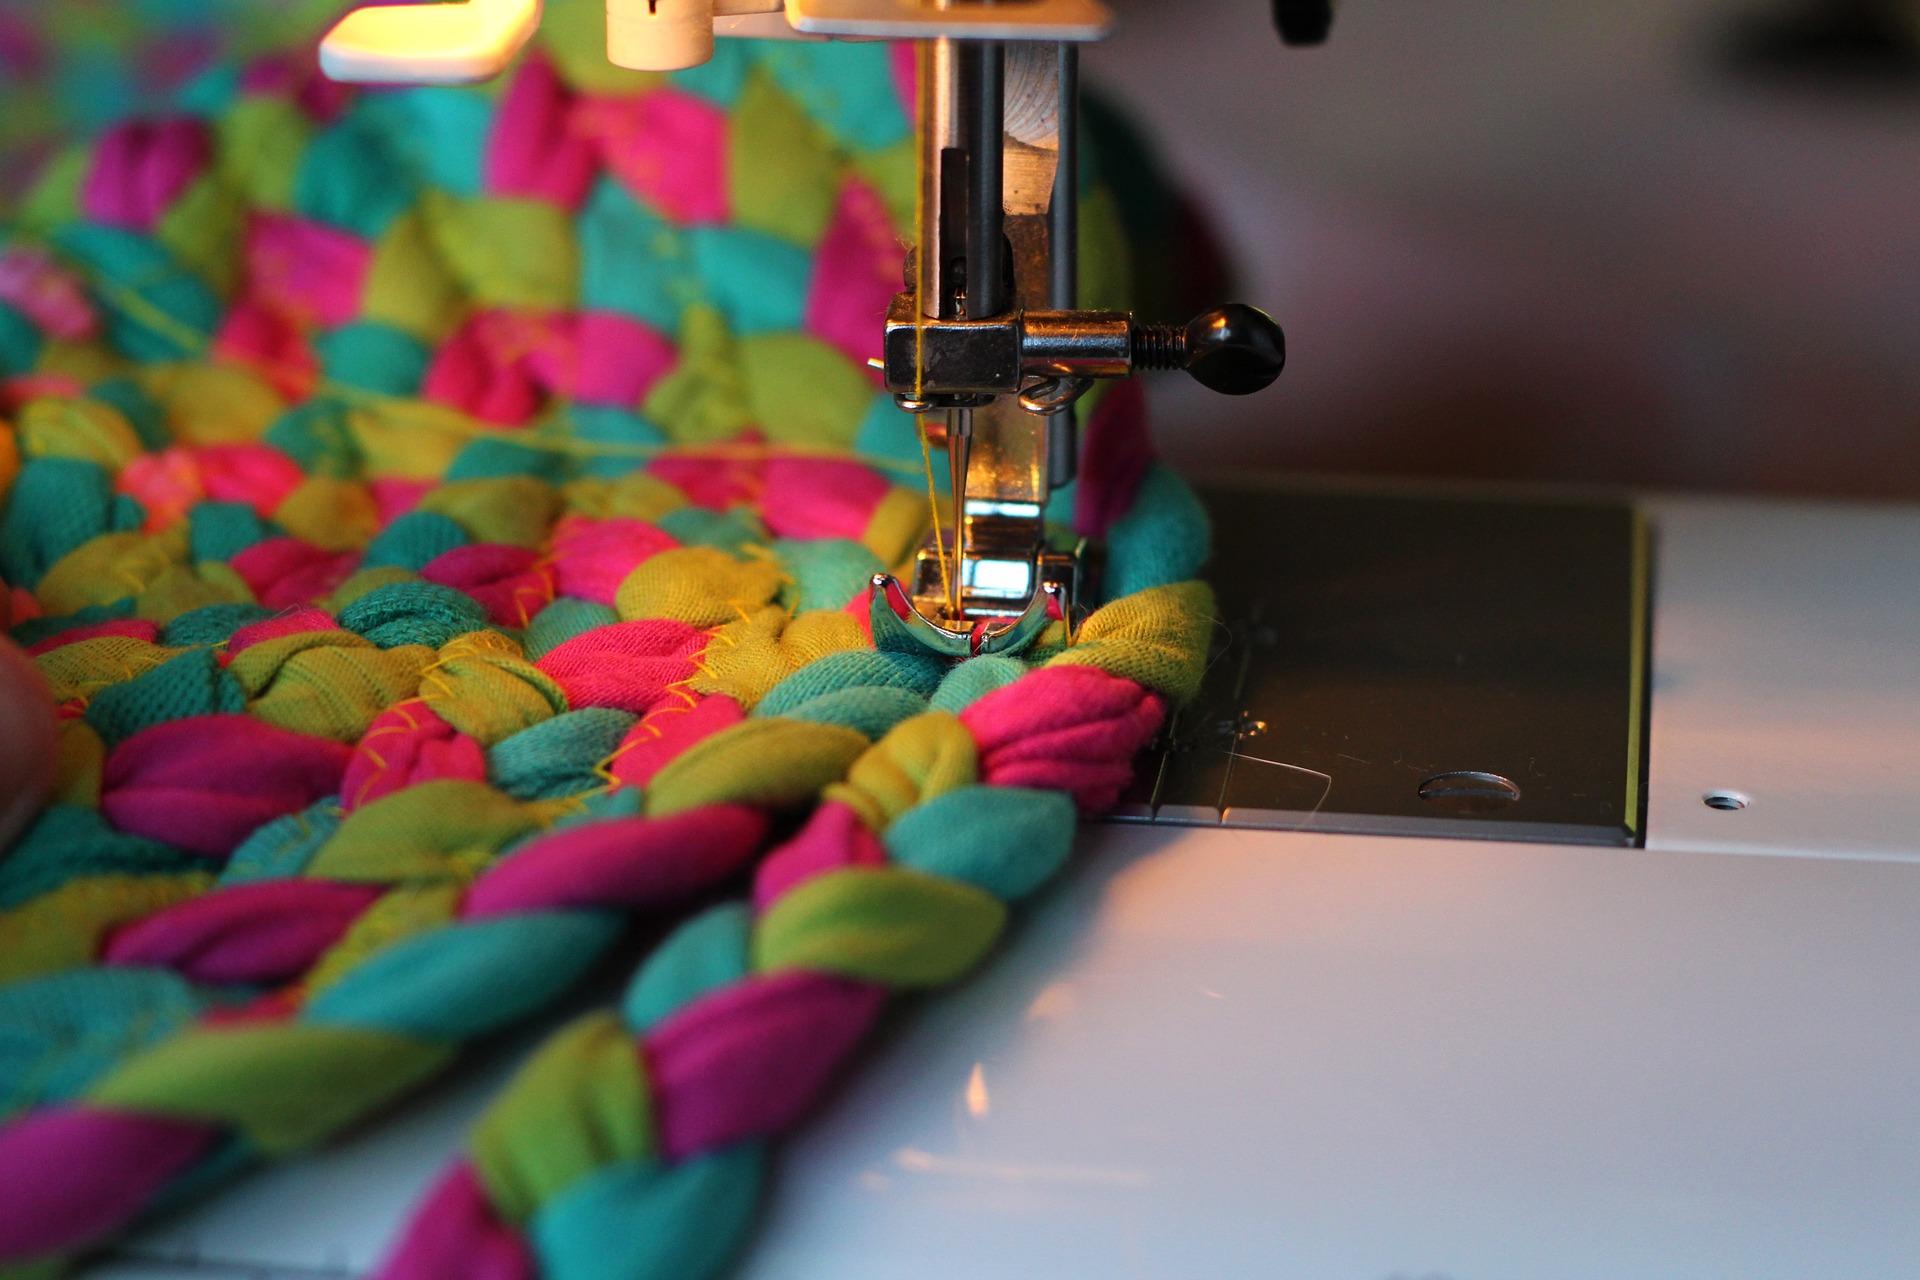 sewing-machine-1507485_1920